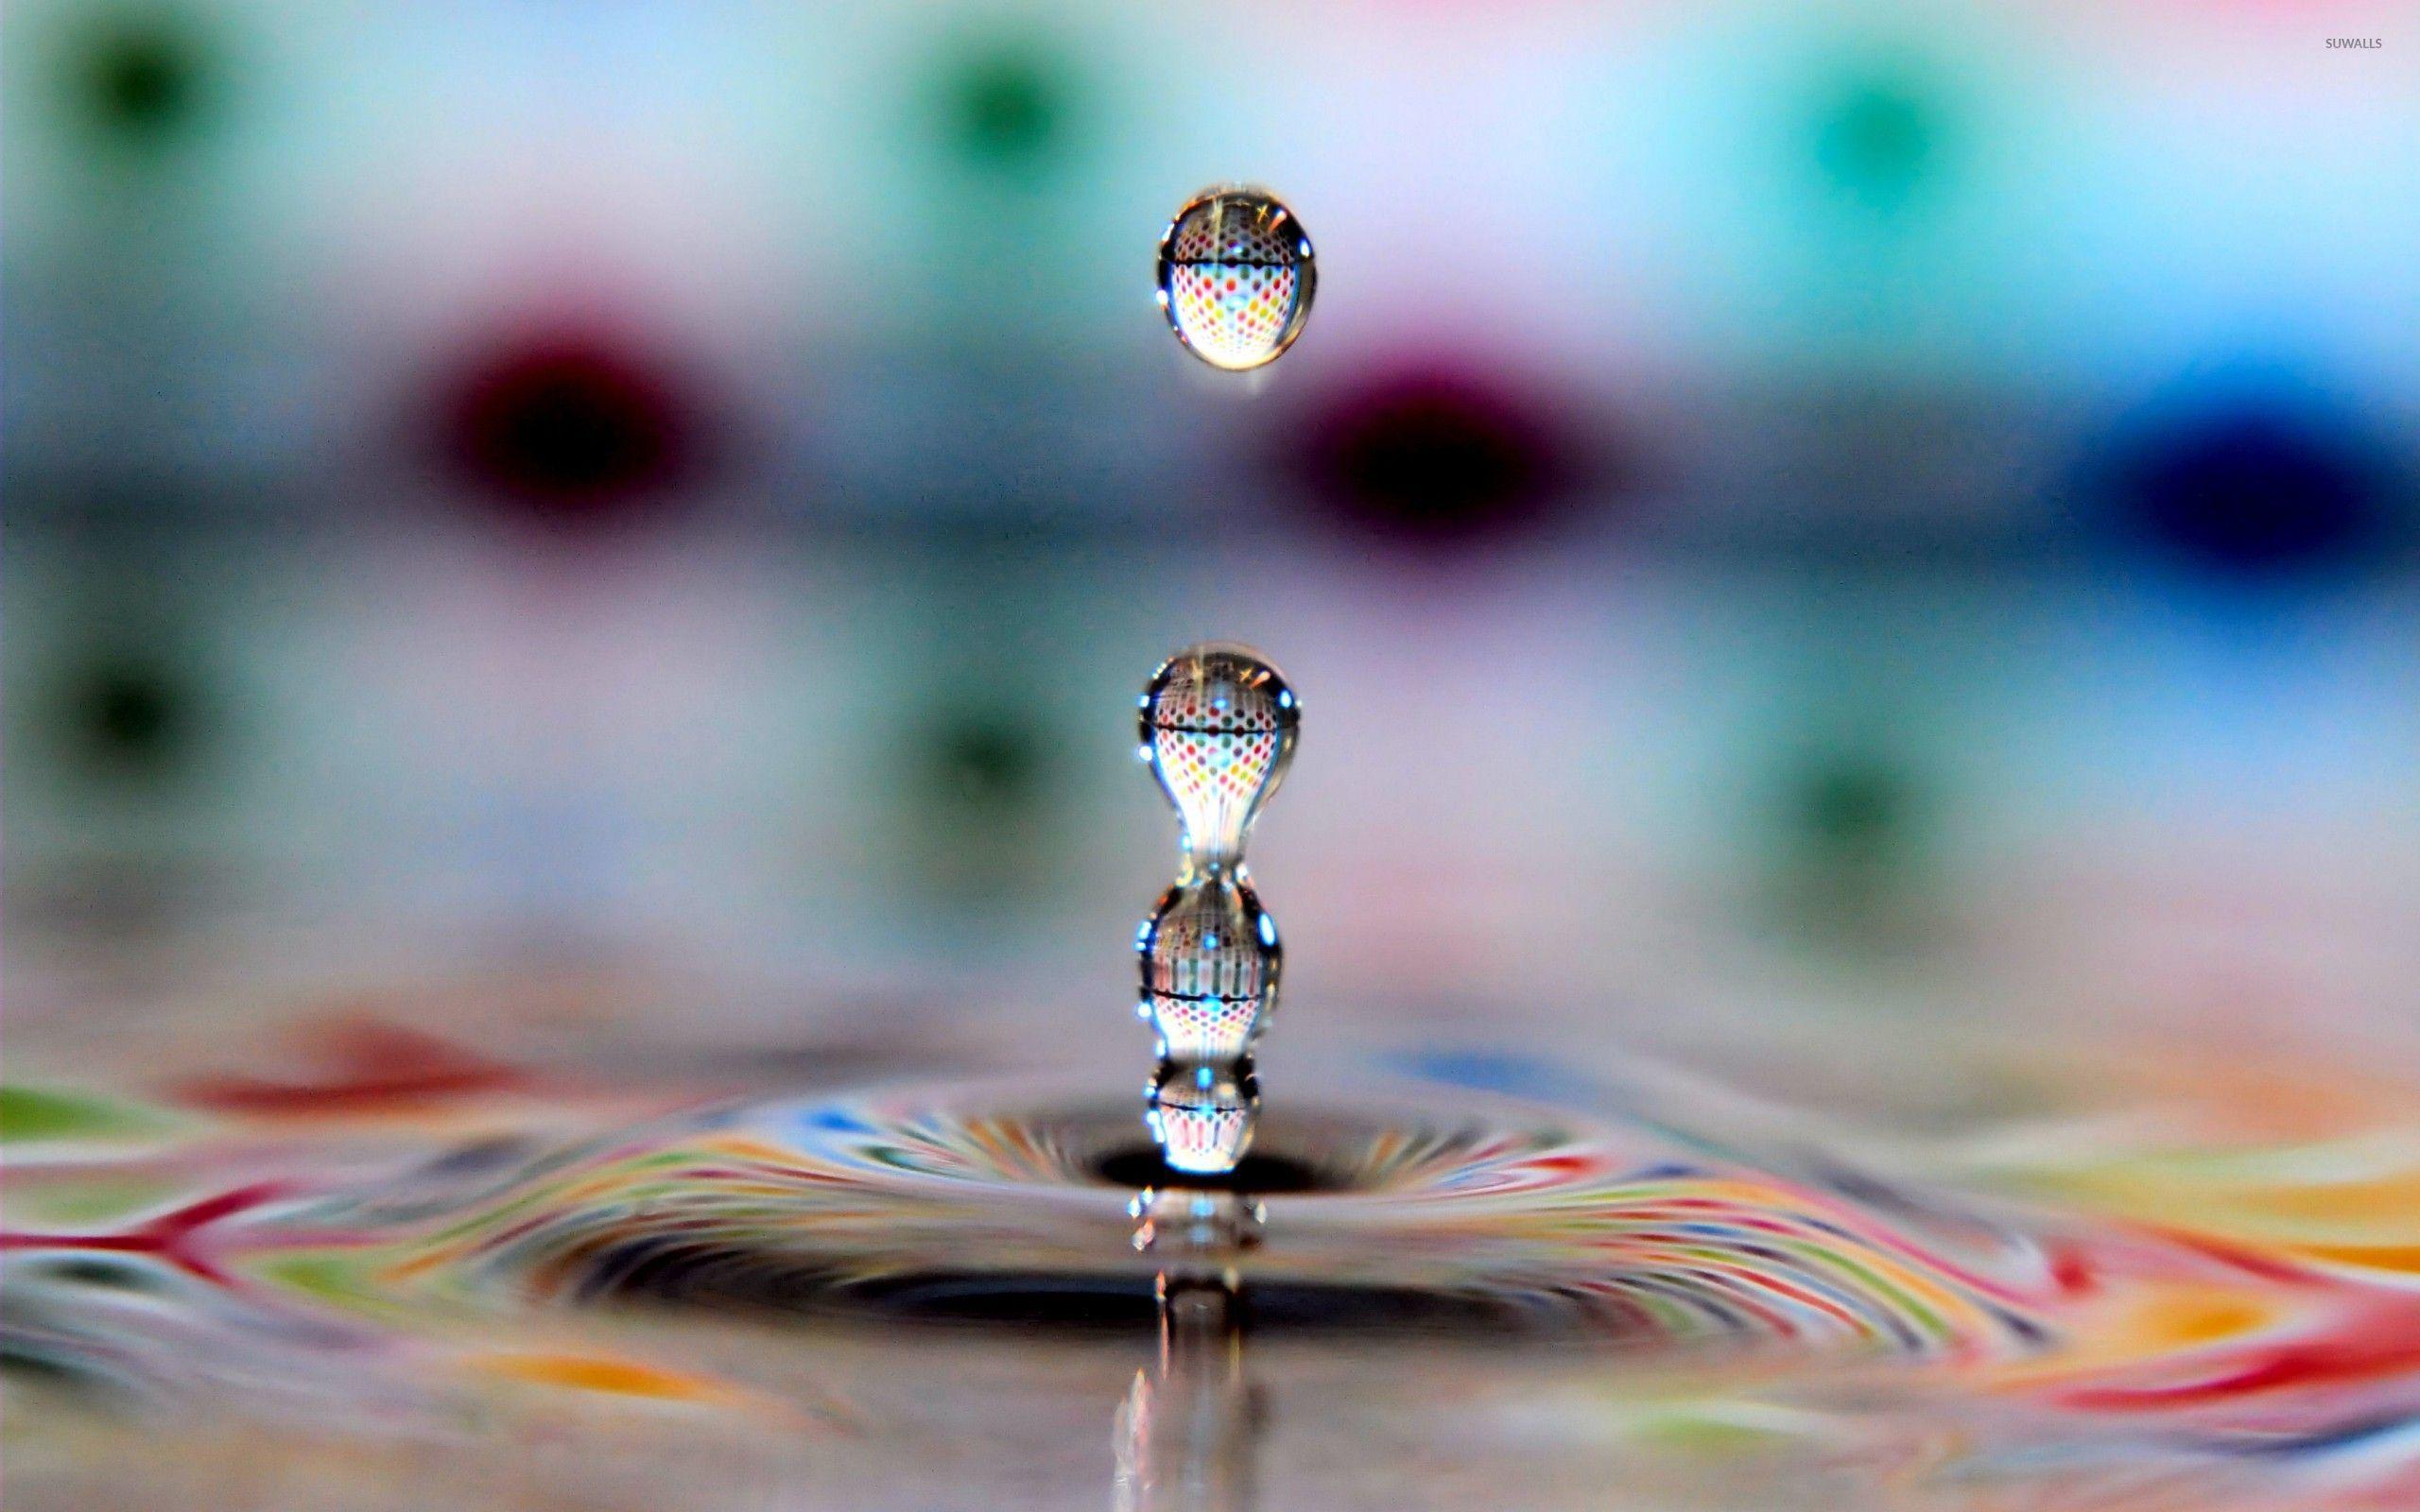 water droplet wallpaper Digital Art Pinterest Water droplets